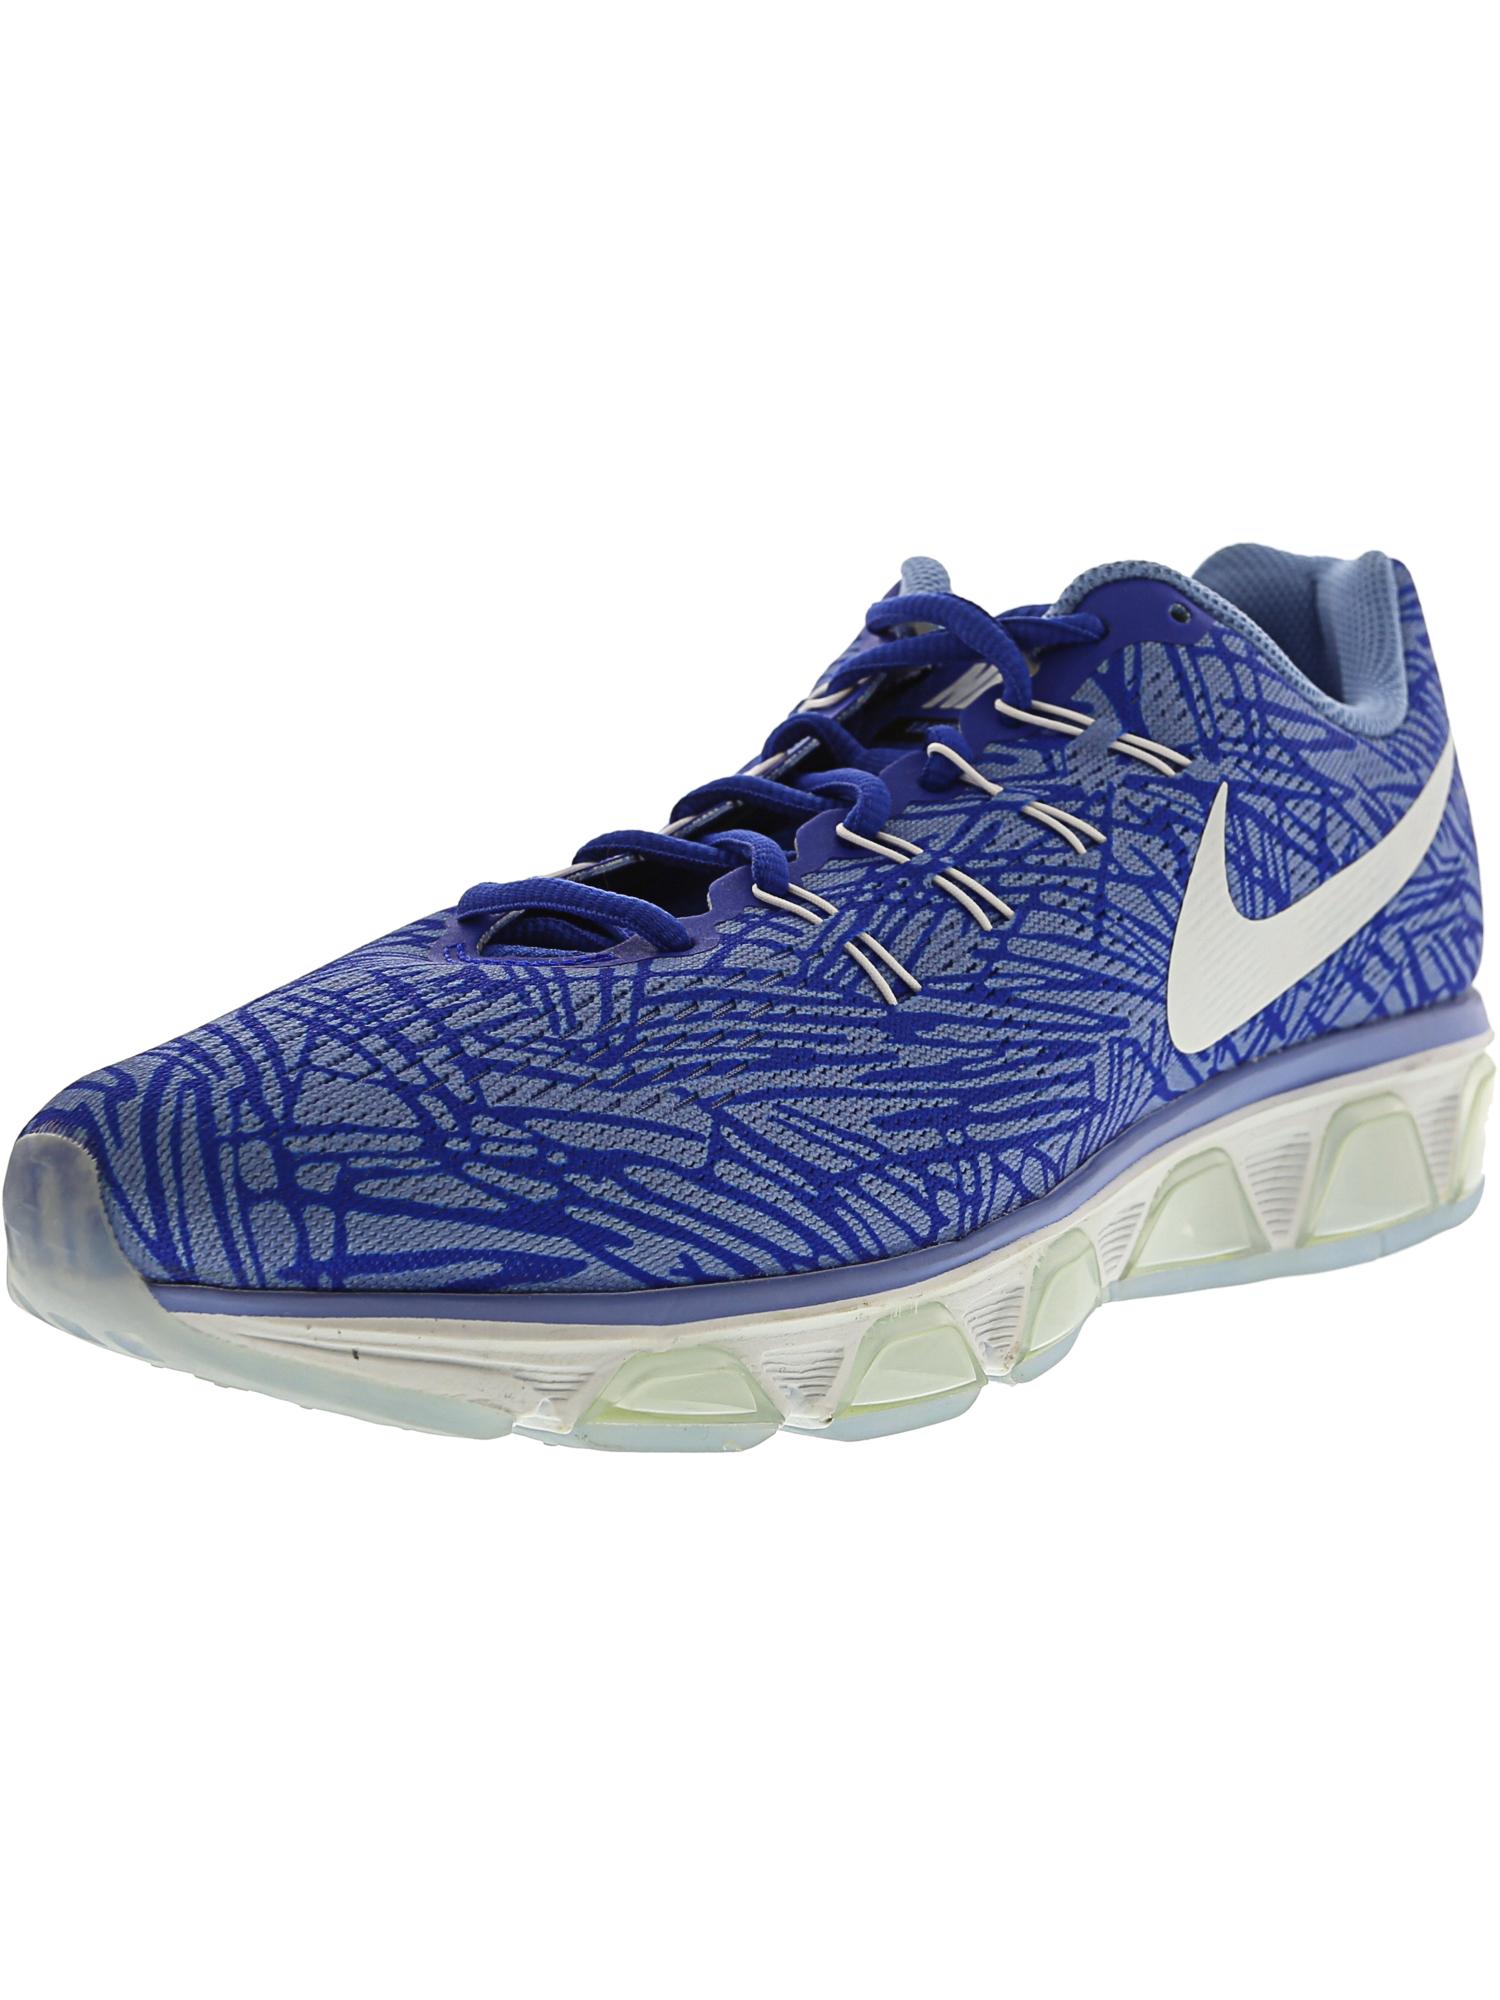 best service a967d 30996 Nike-Women-039-s-Air-Max-Tailwind-8-